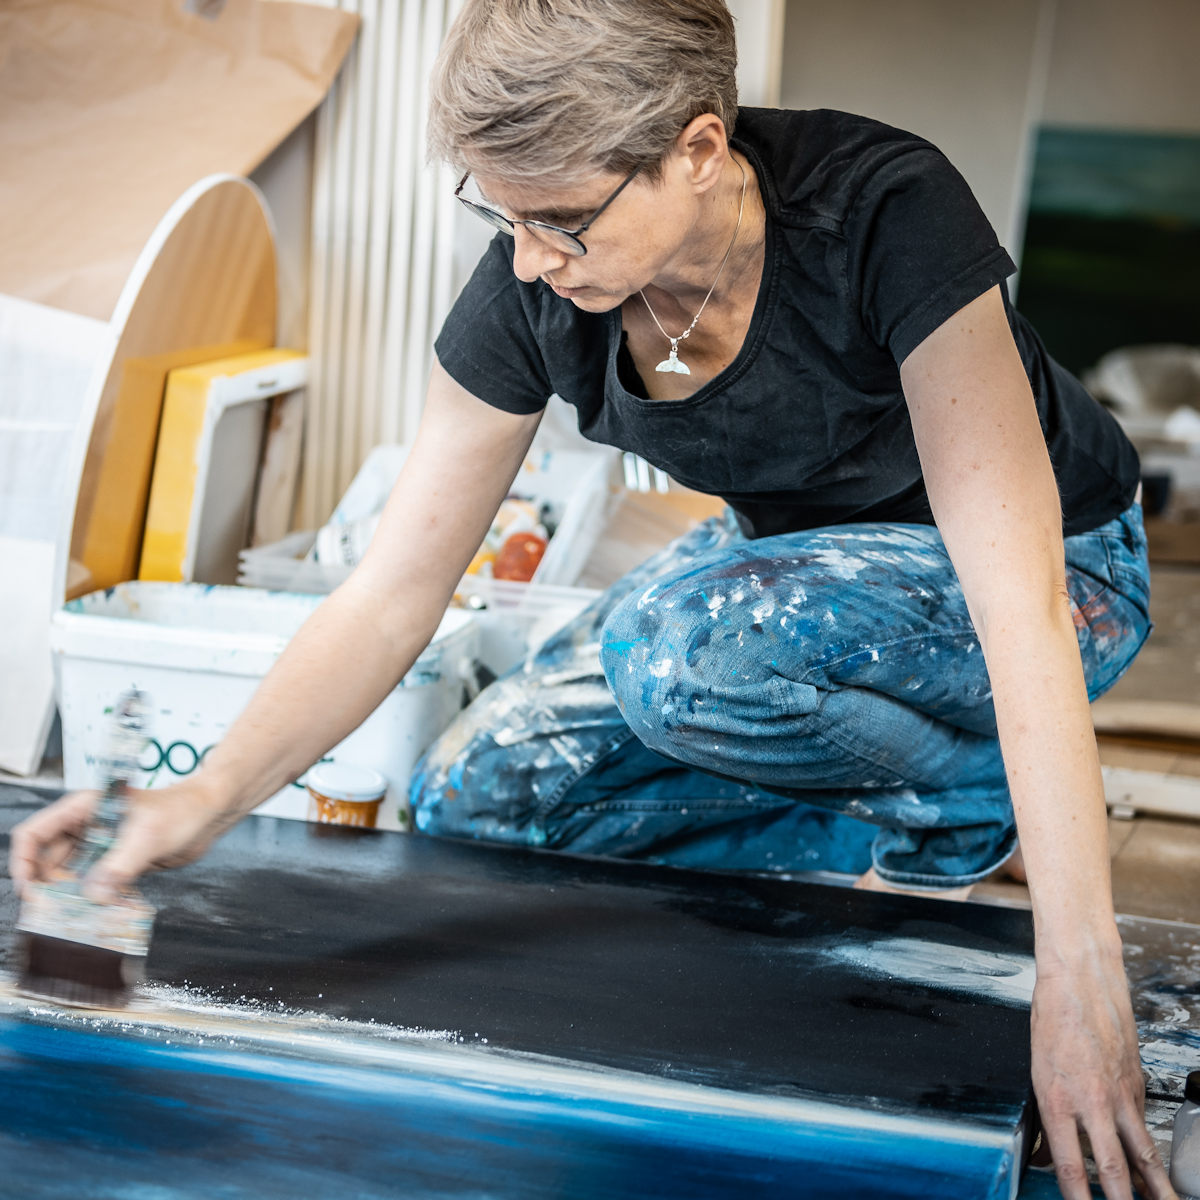 Künstlerin Eva Doelker-Heim im kreativen Prozess